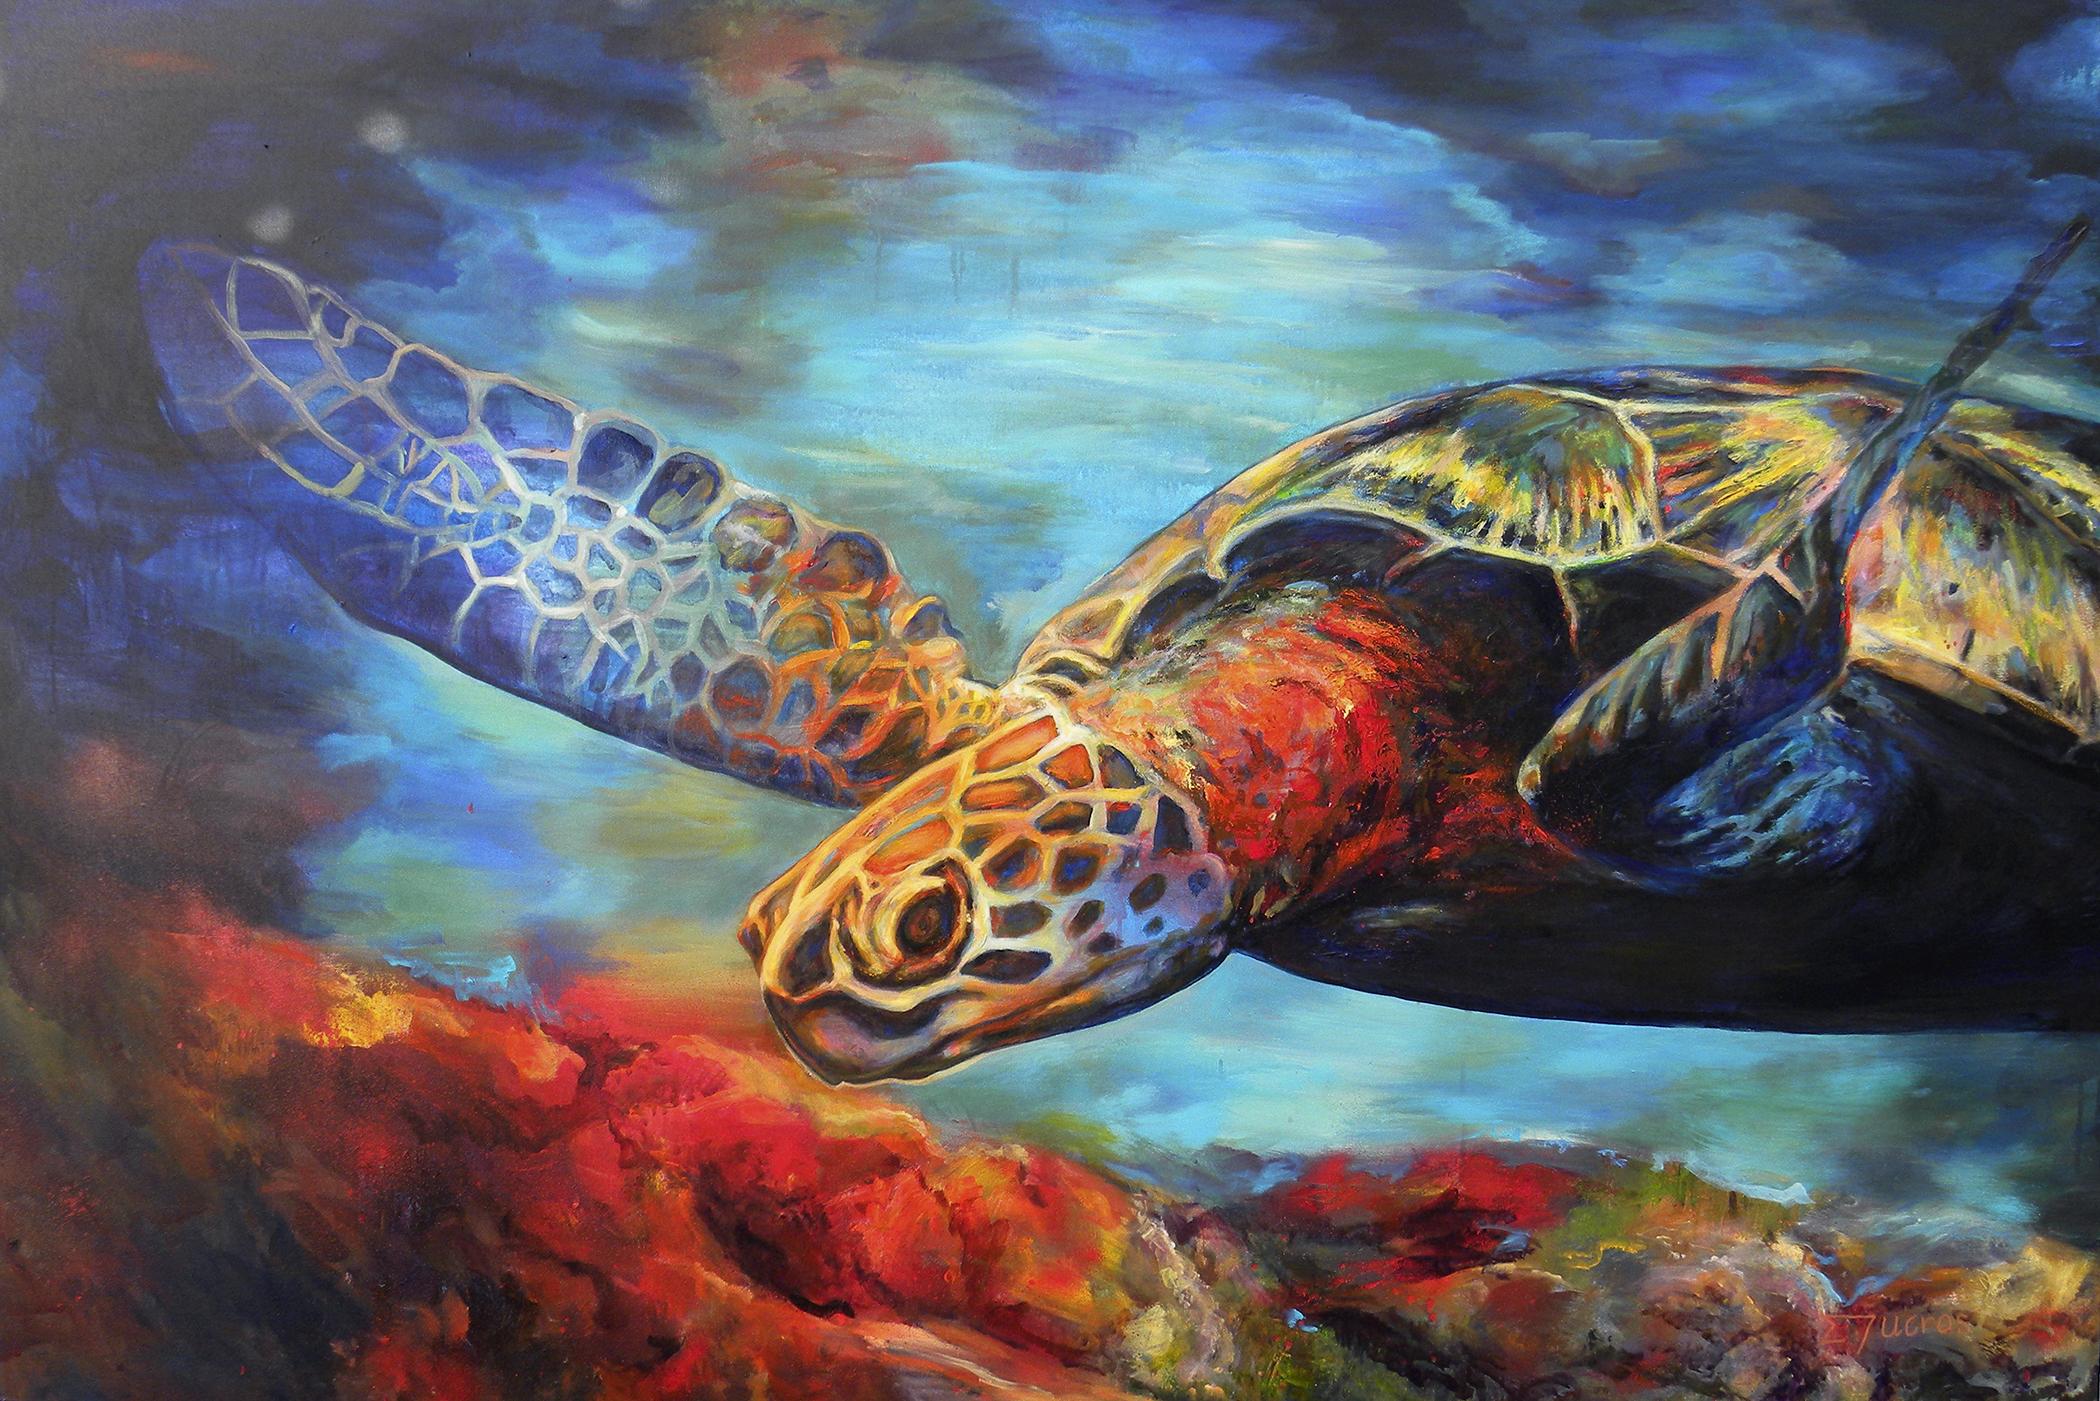 Terry's Turtle